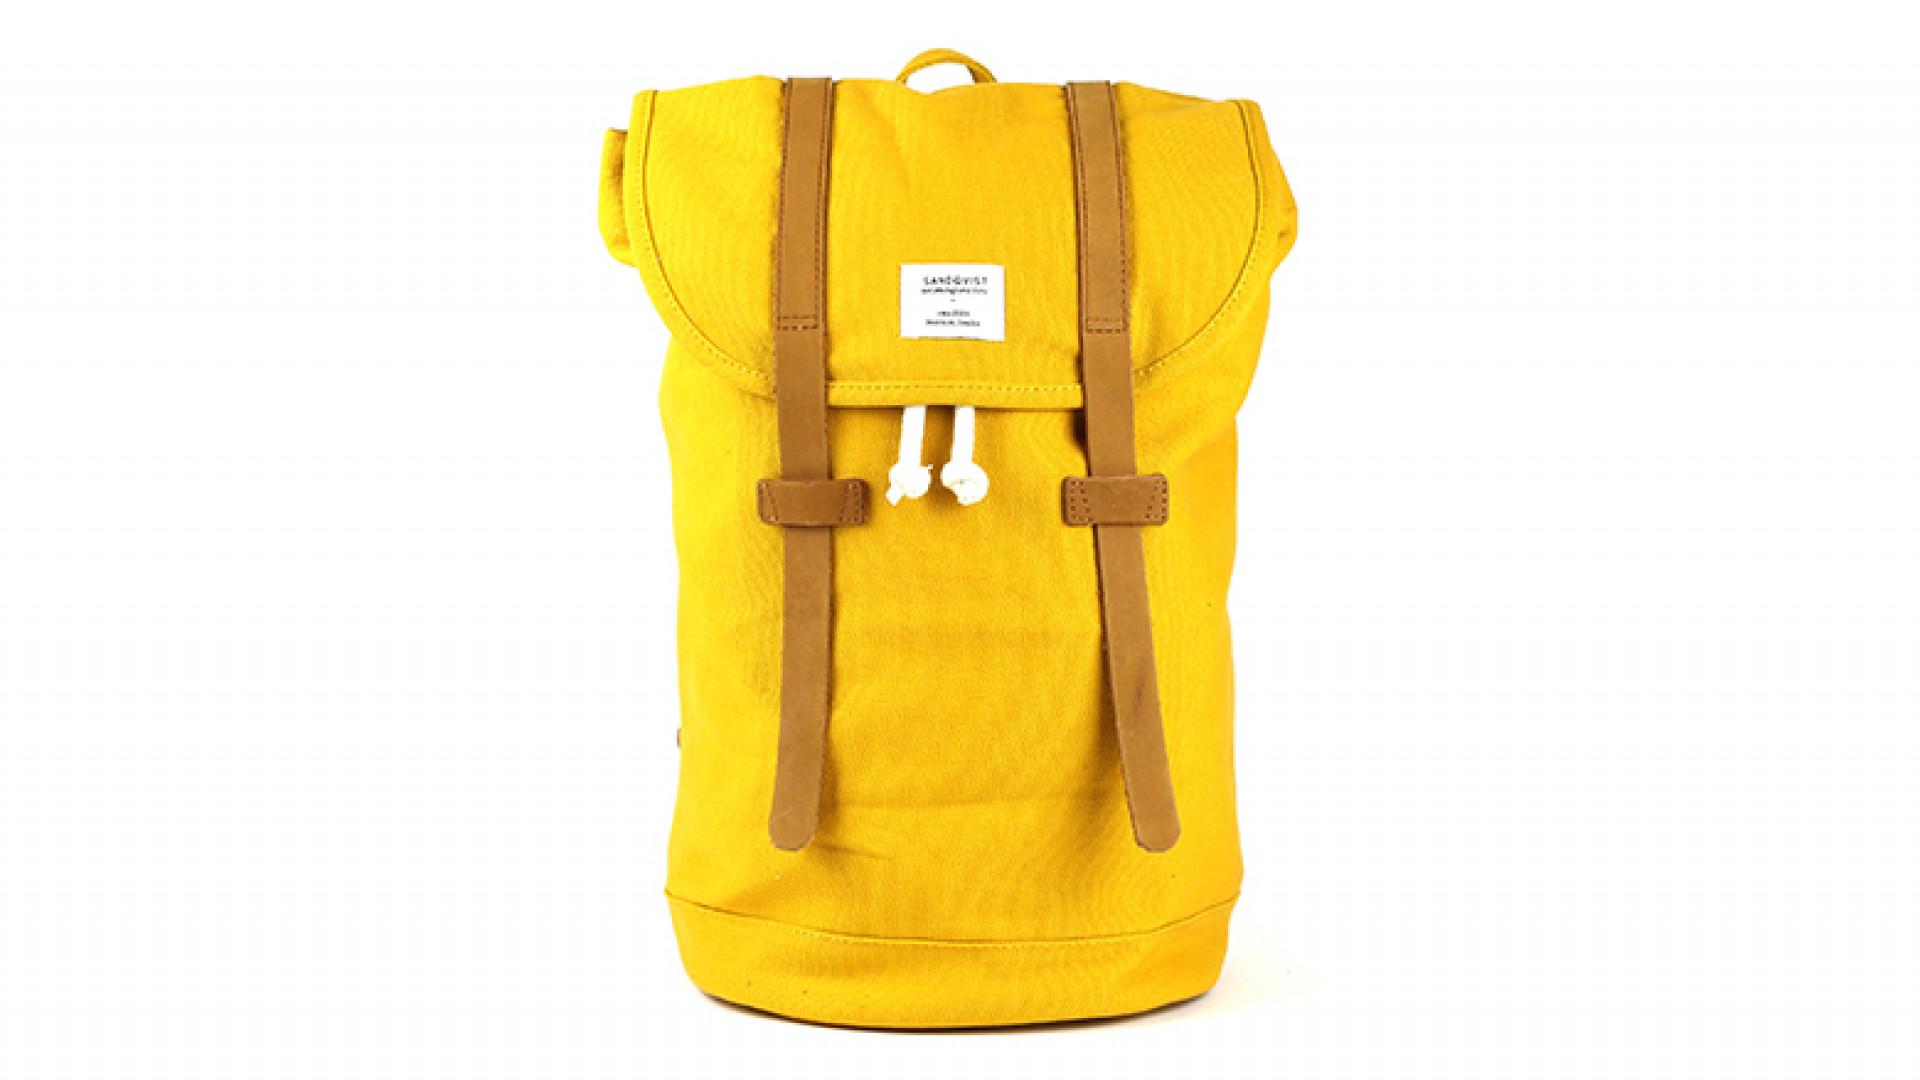 SANDQVIST-Yellow-Canvas-Stig-Backpack-90GBP